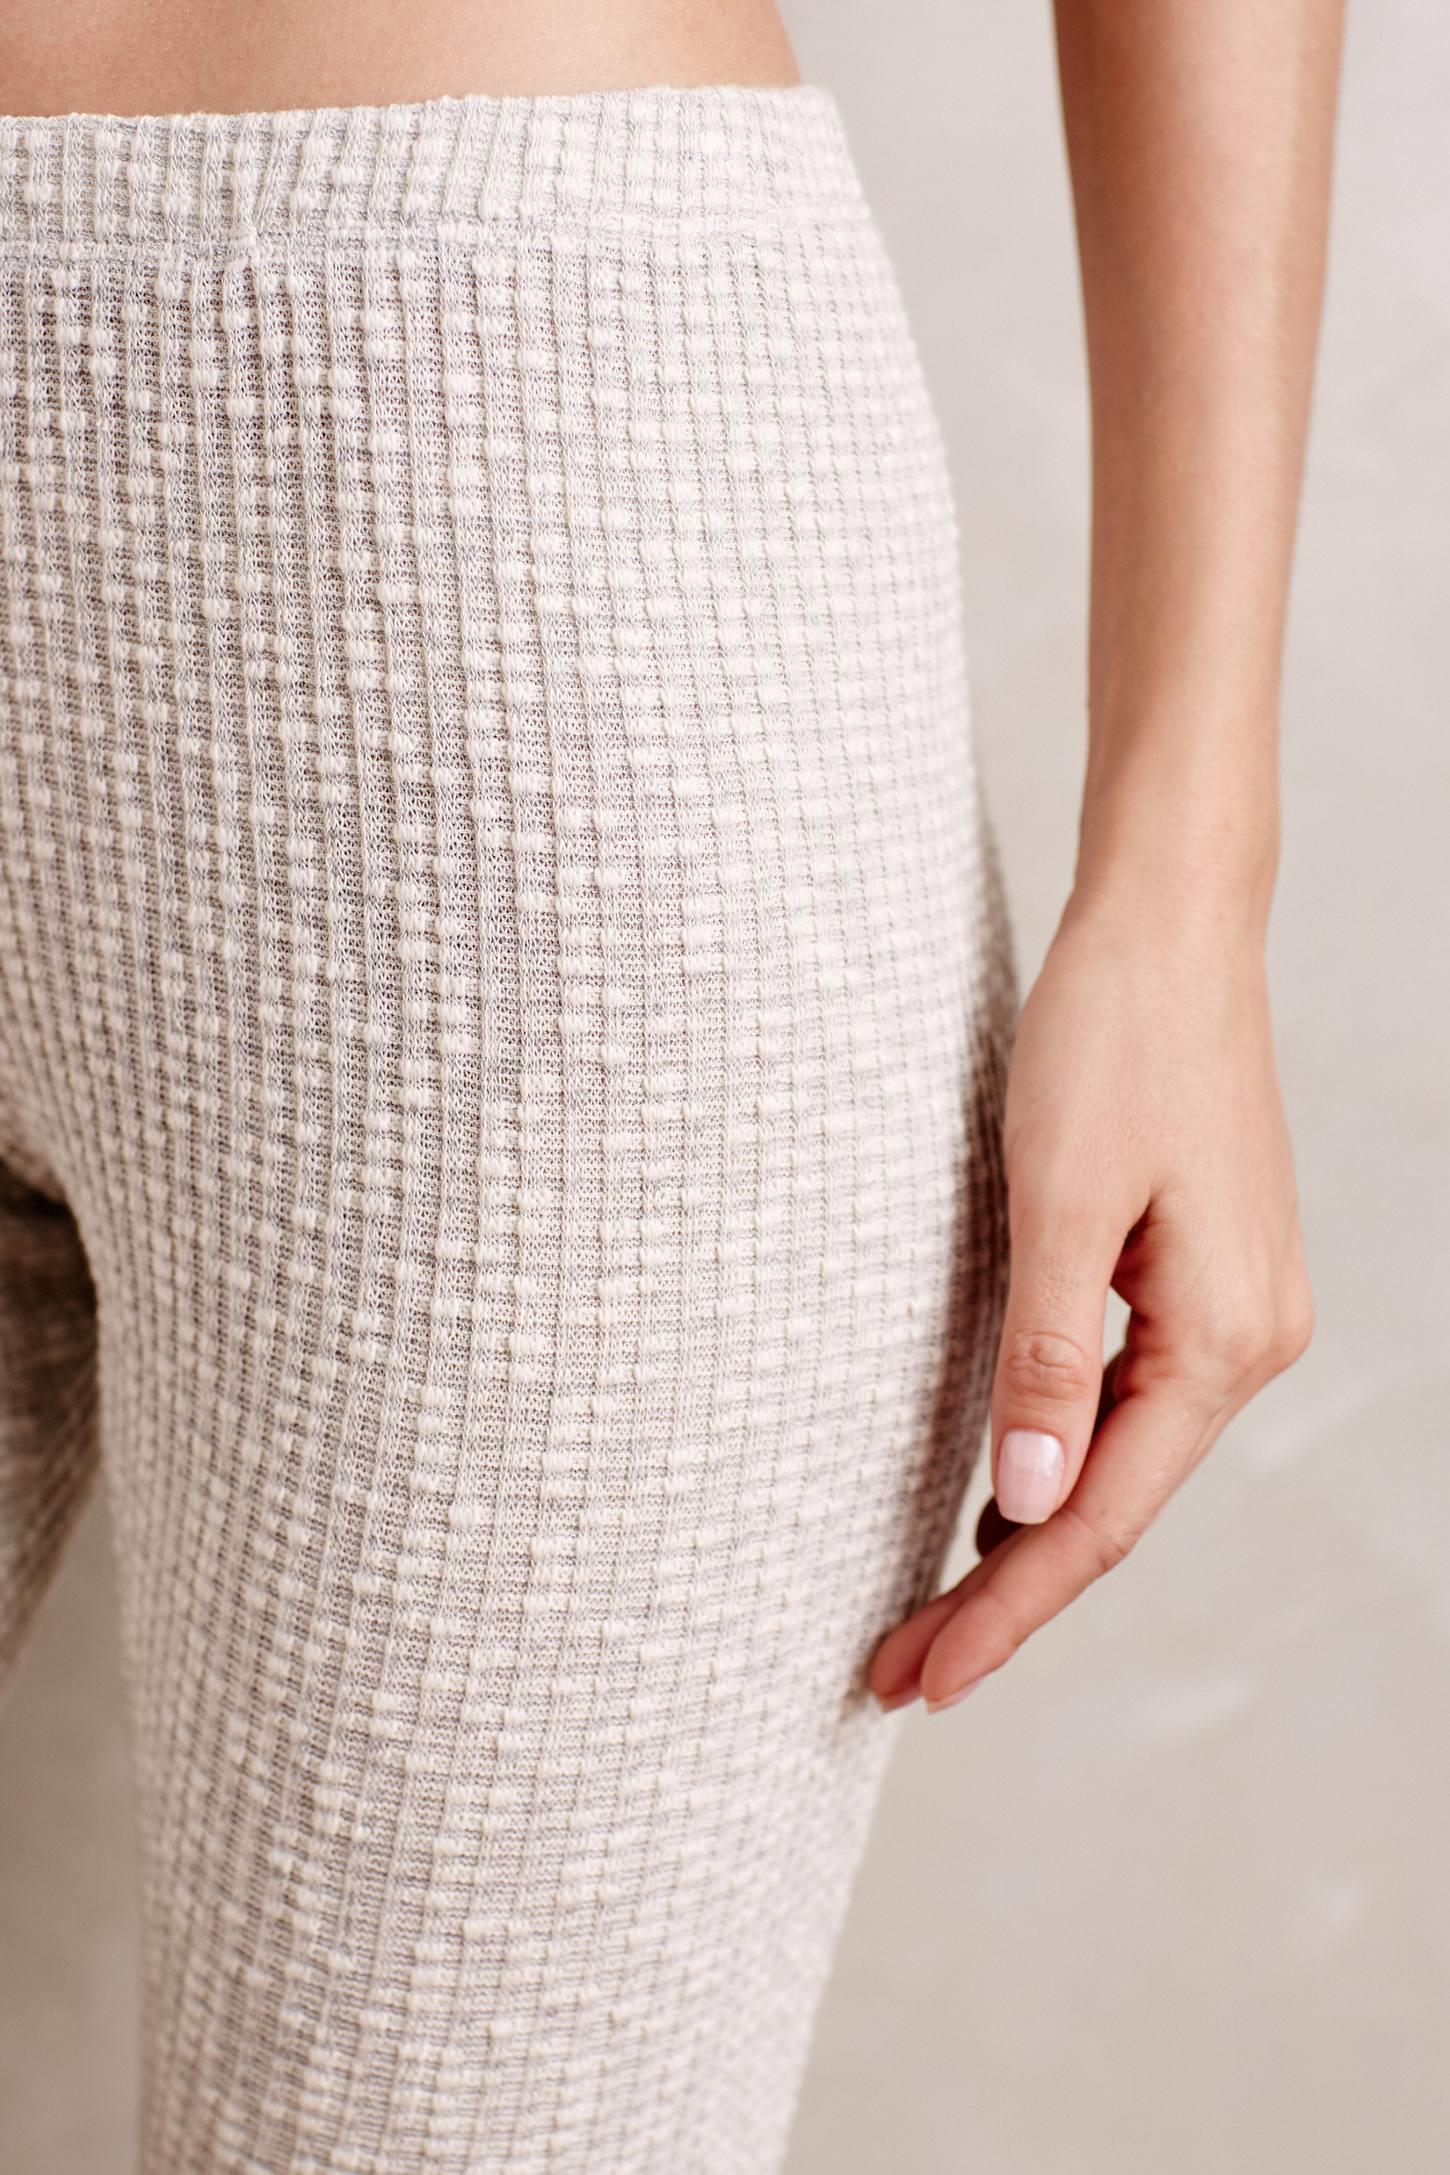 Everleigh Ribbed Sweaterknit Leggings in Natural   Lyst